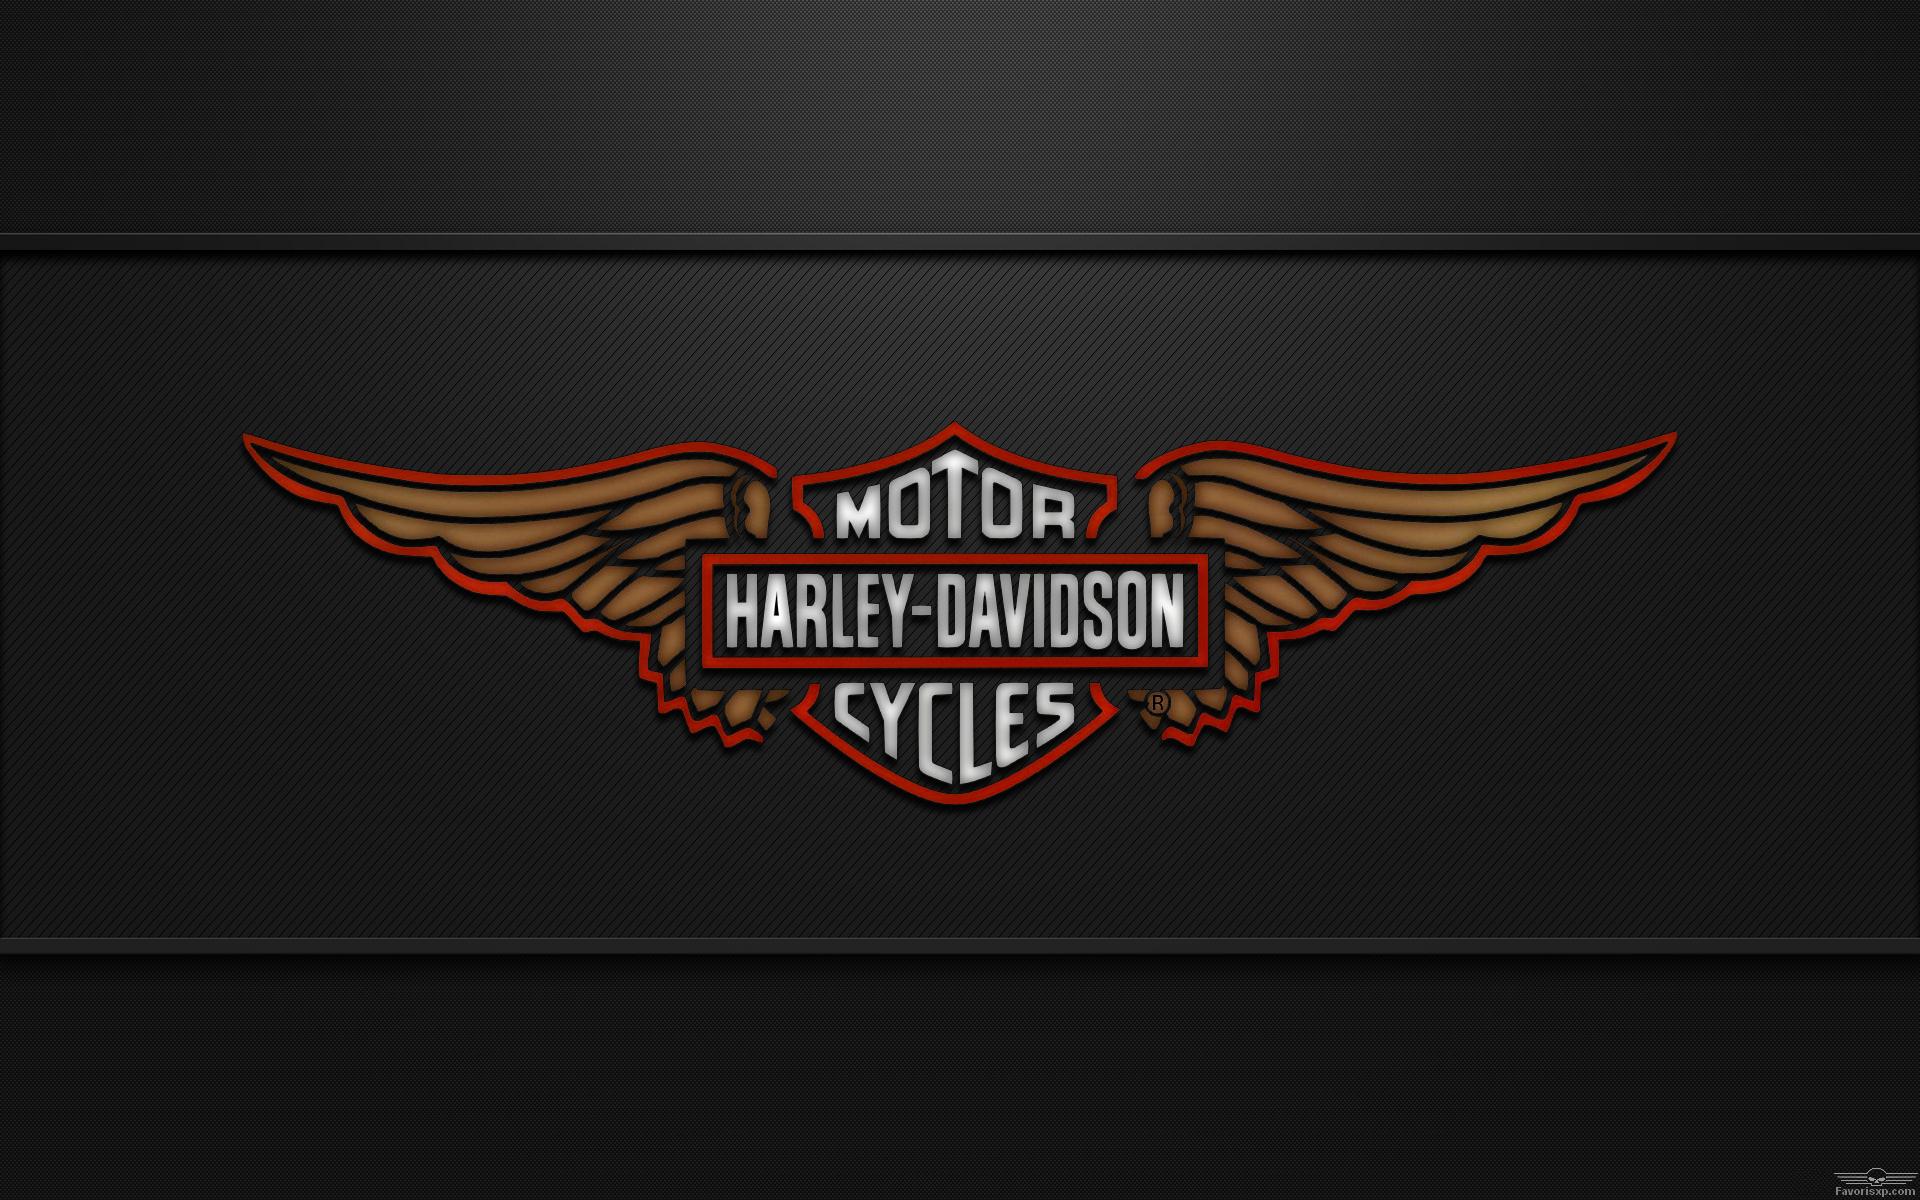 newest harley davidson logo wallpapers - photo #31